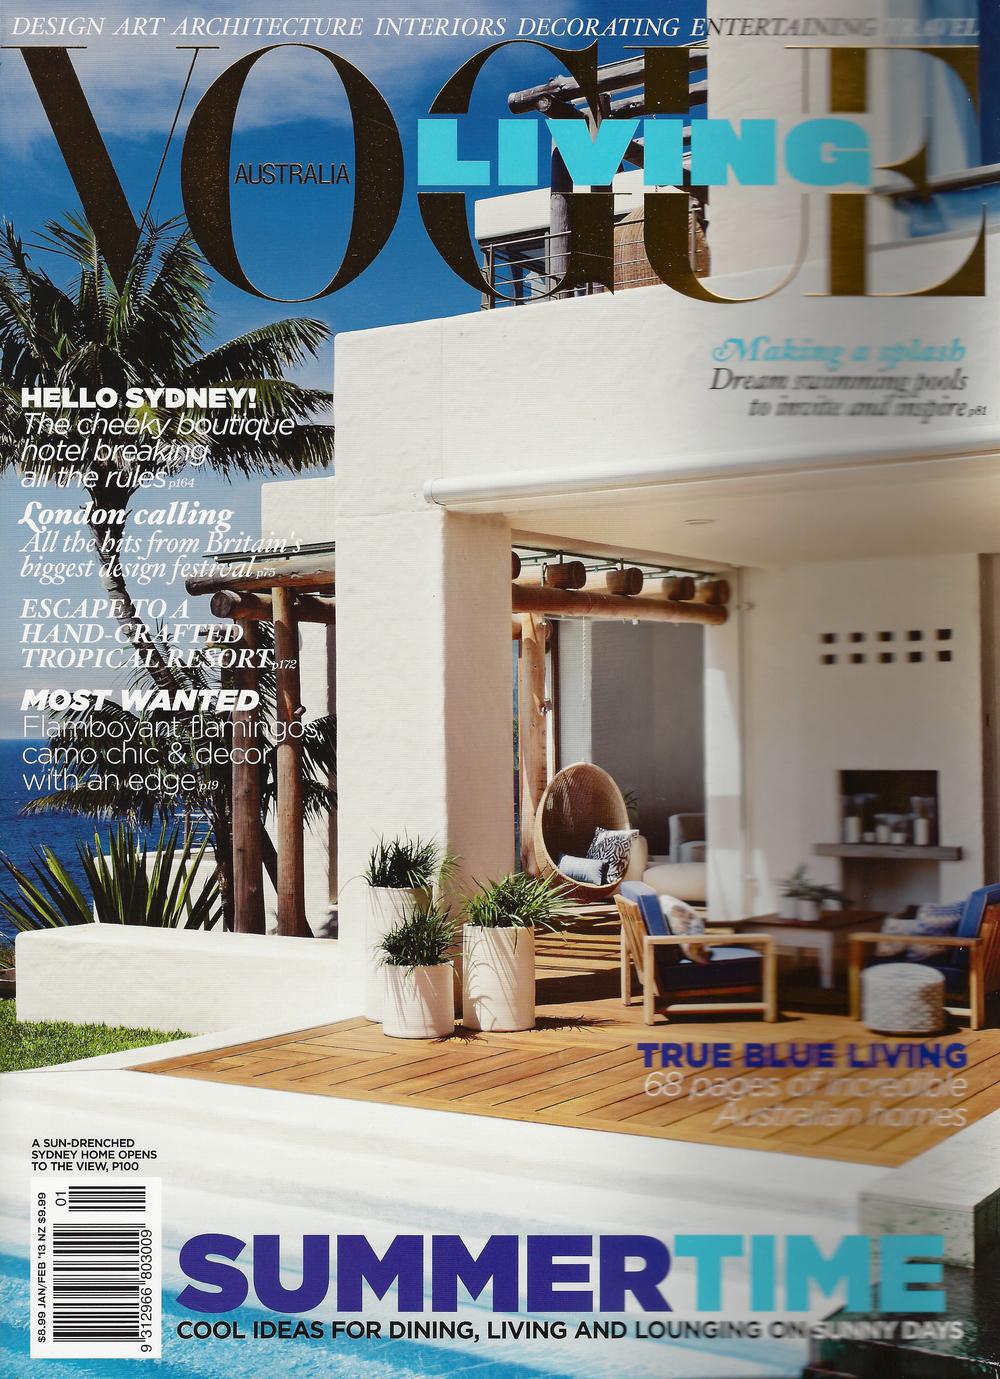 Vogue Living Jan 2013 cover.jpg